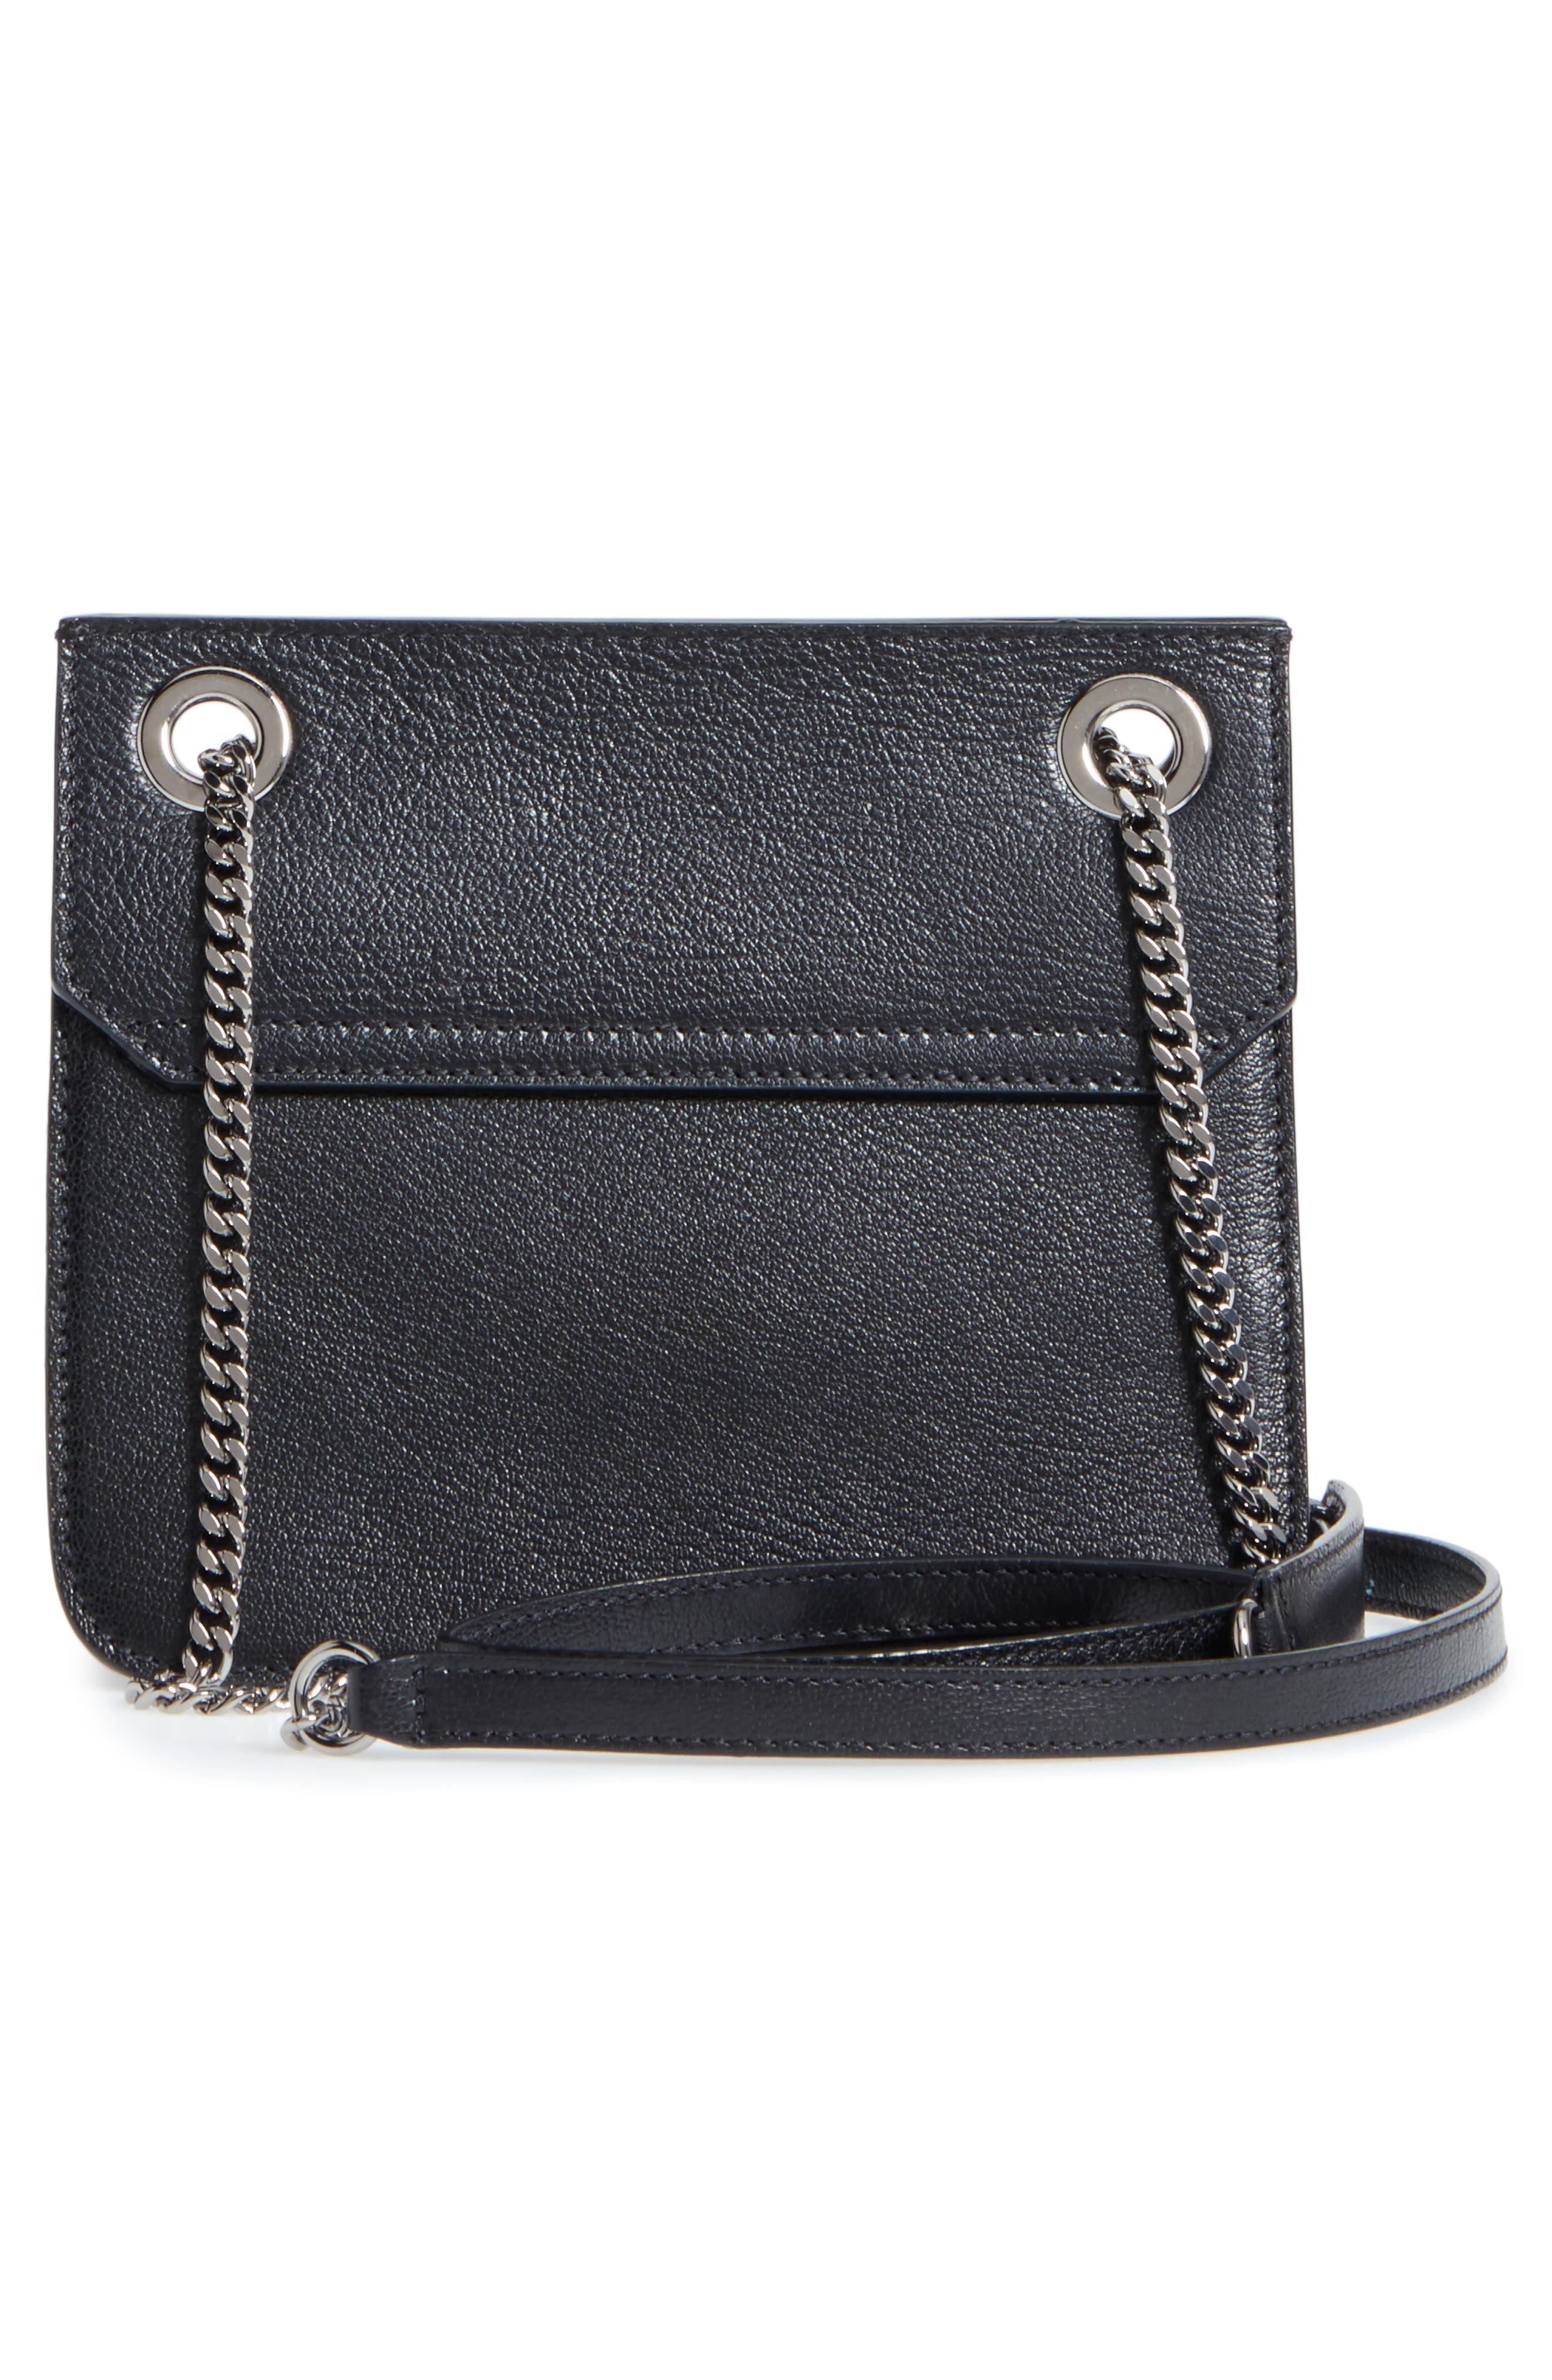 Rebel Leather Crossbody Bag,                             Alternate thumbnail 3, color,                             BLACK/ GUNMETAL